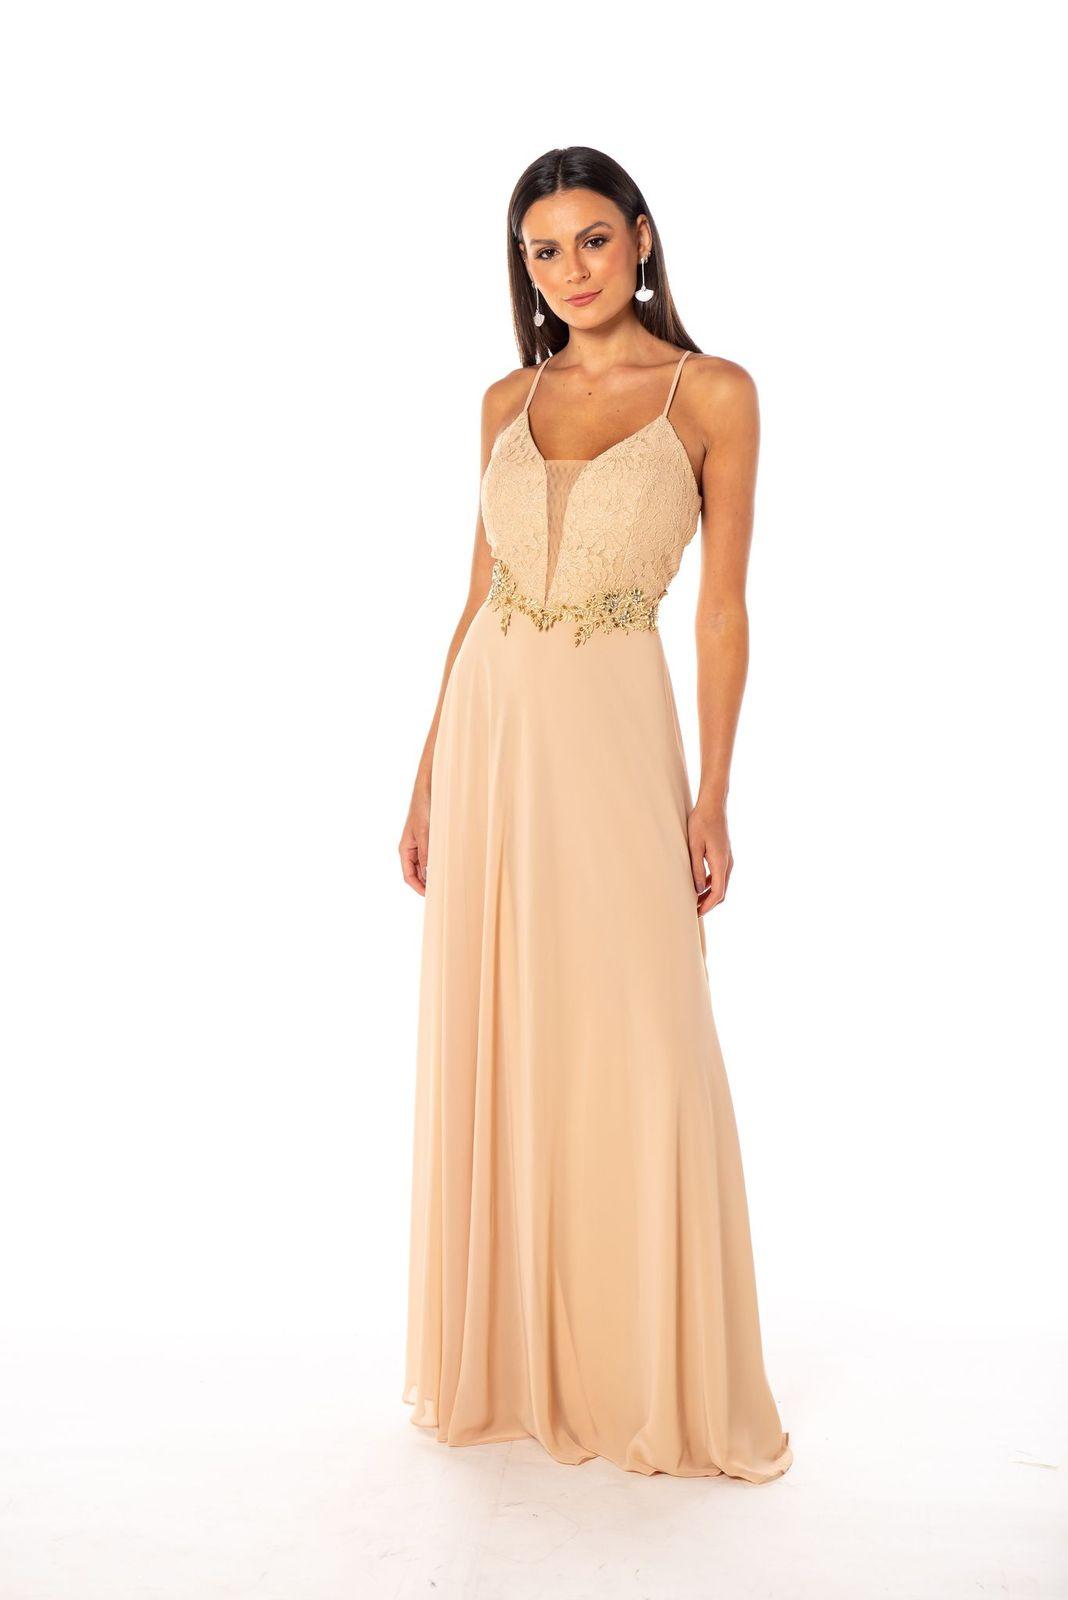 Vestido Campinas Nude Dourado